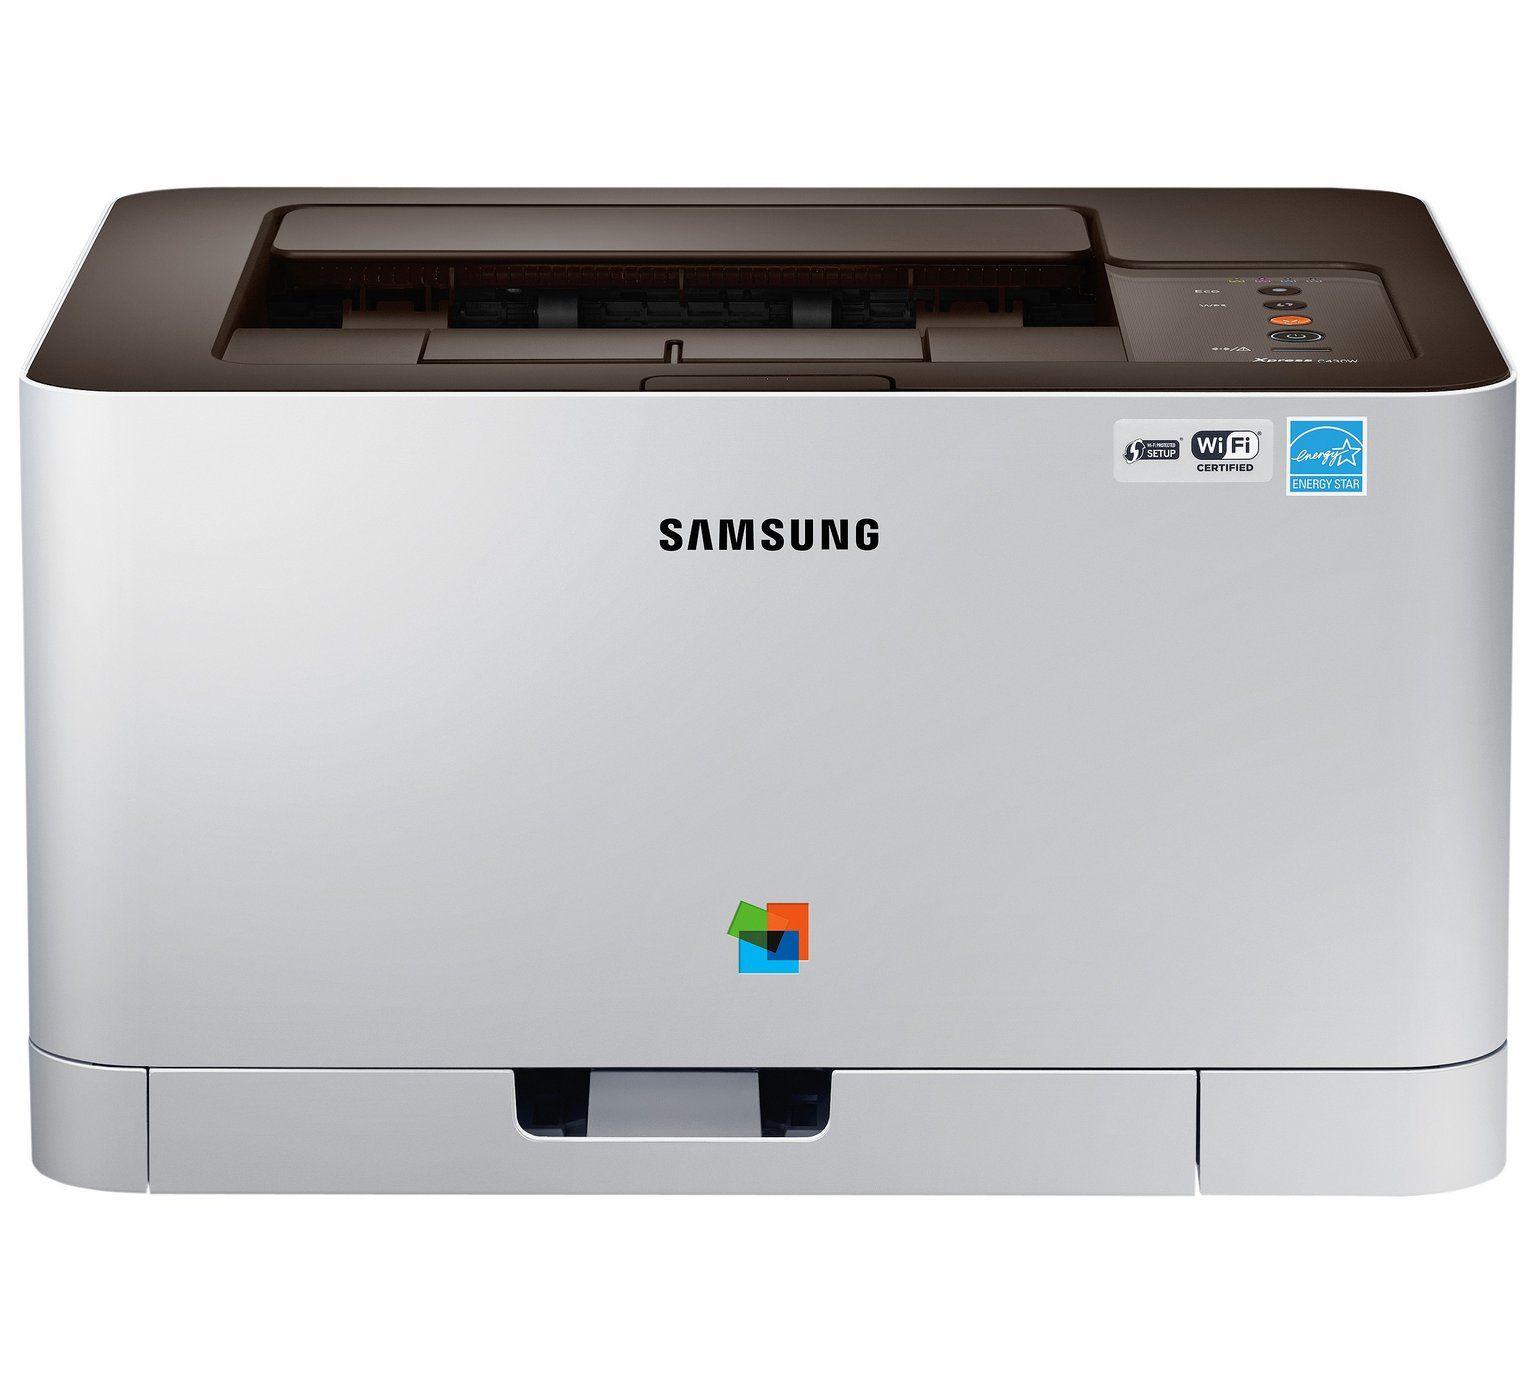 Samsung SL-C430W Wi-Fi Colour Laser Printer £99.99 @ Argos